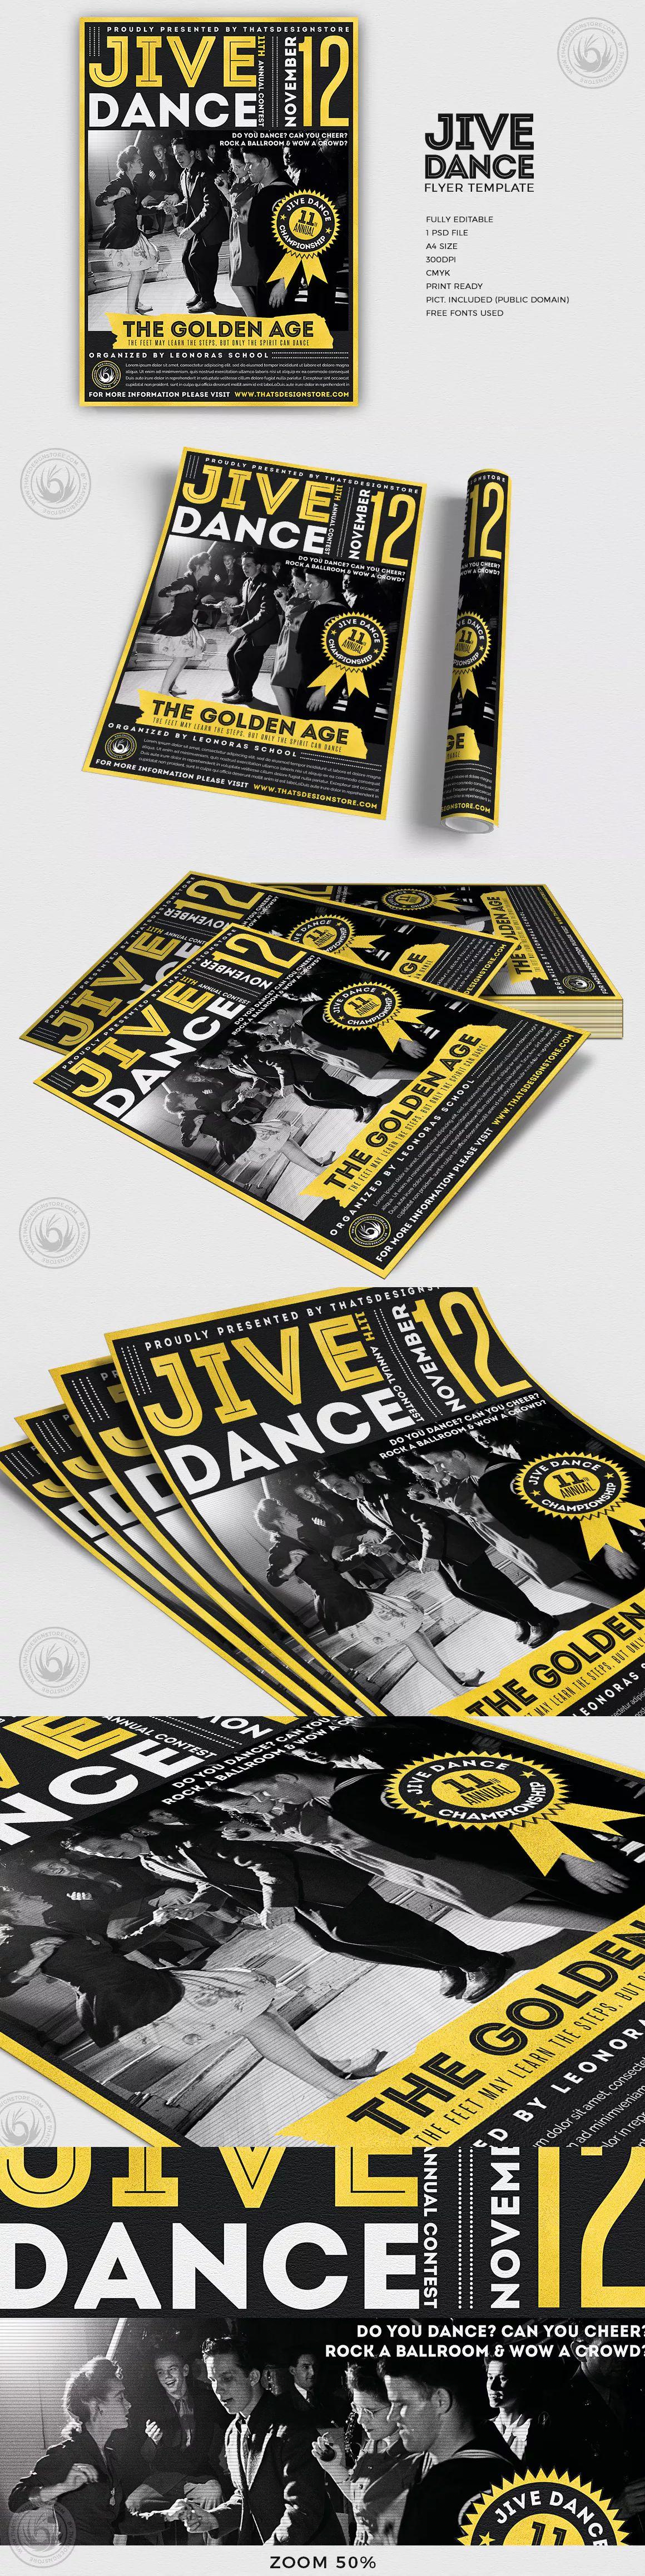 Jive Dance Flyer Template PSD - A4 | Flyer Design Templates ...